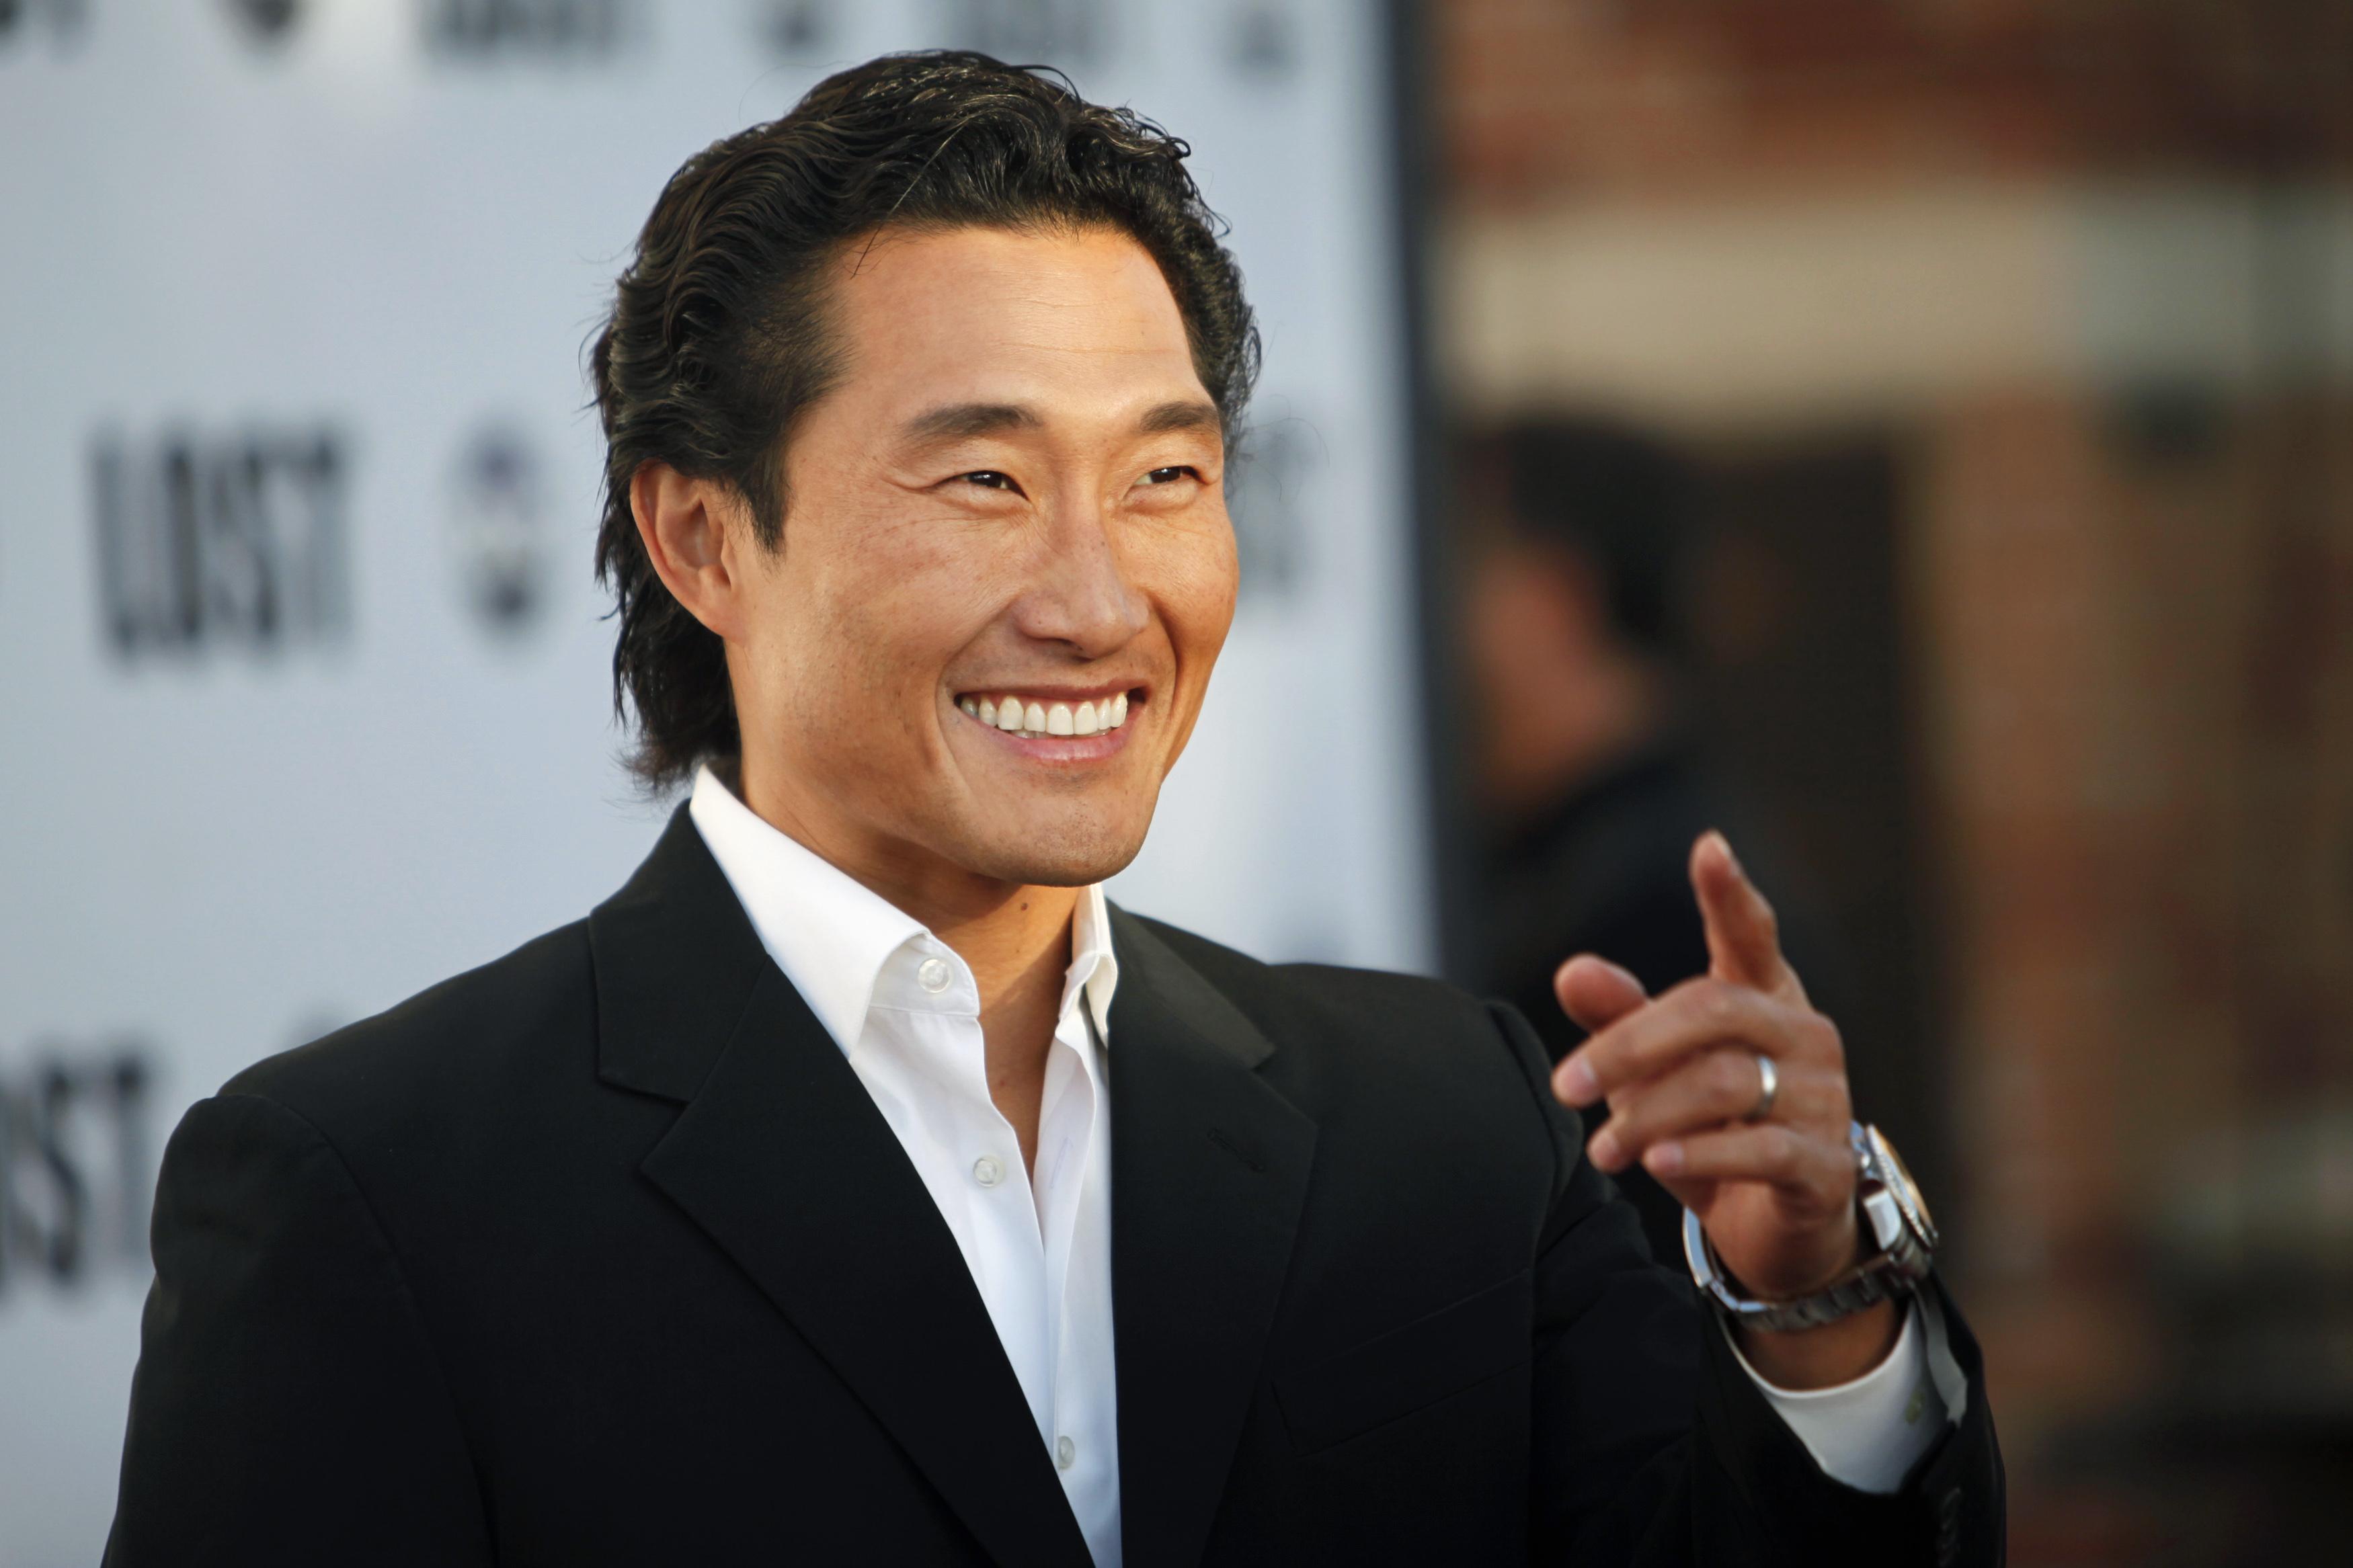 Image: Actor Daniel Dae Kim arrives at ABC's